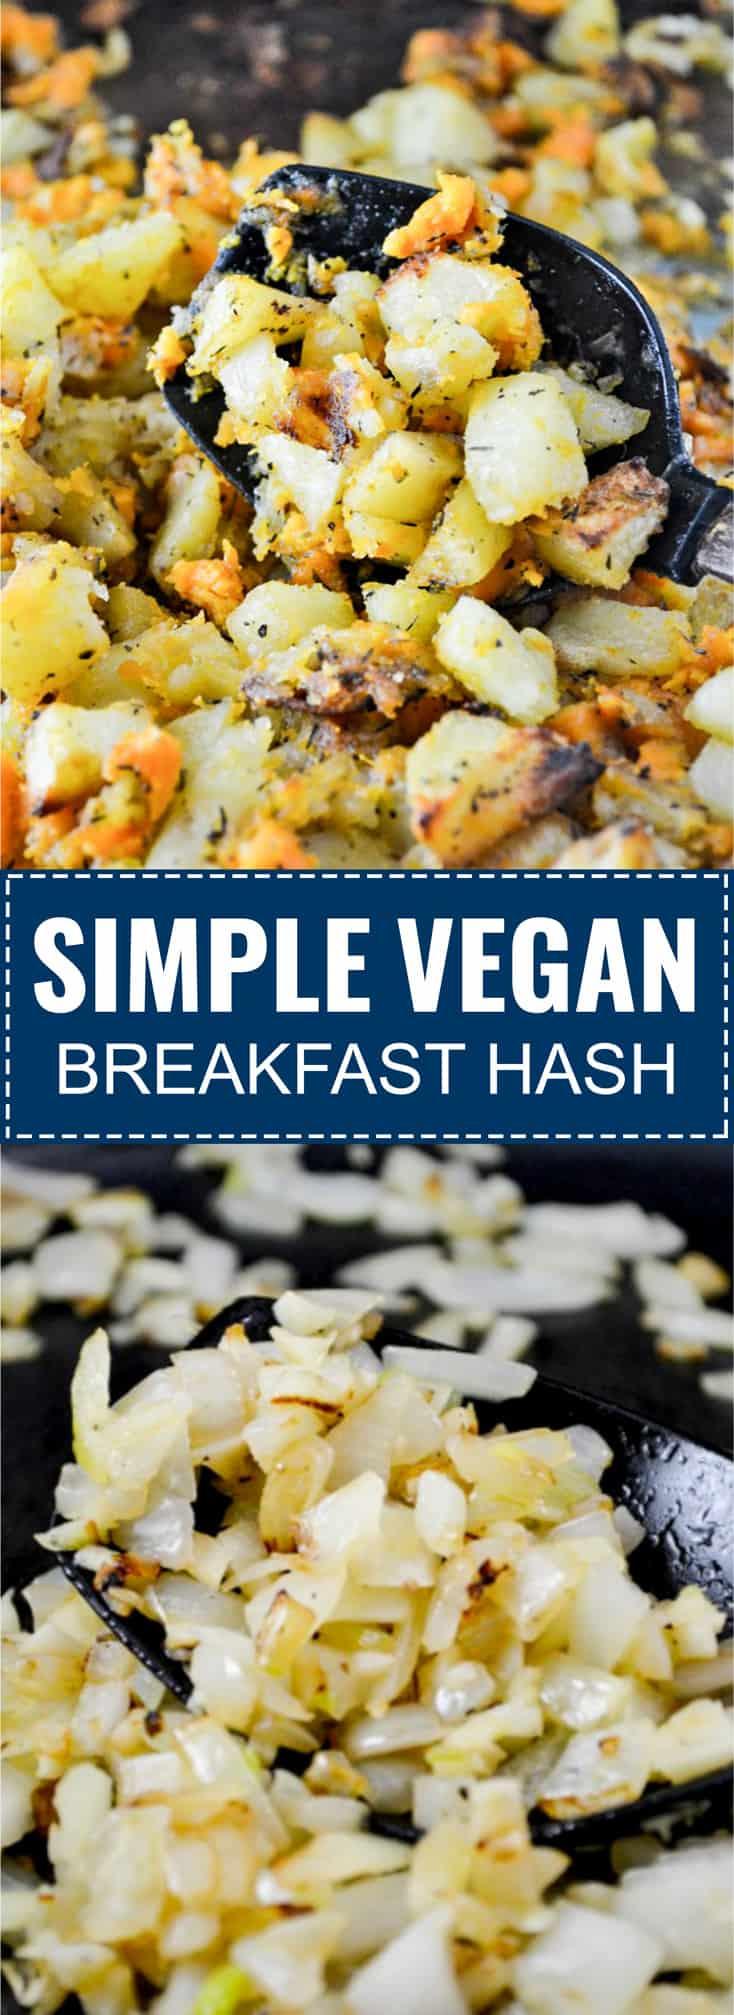 simple vegan breakfast hash recipe